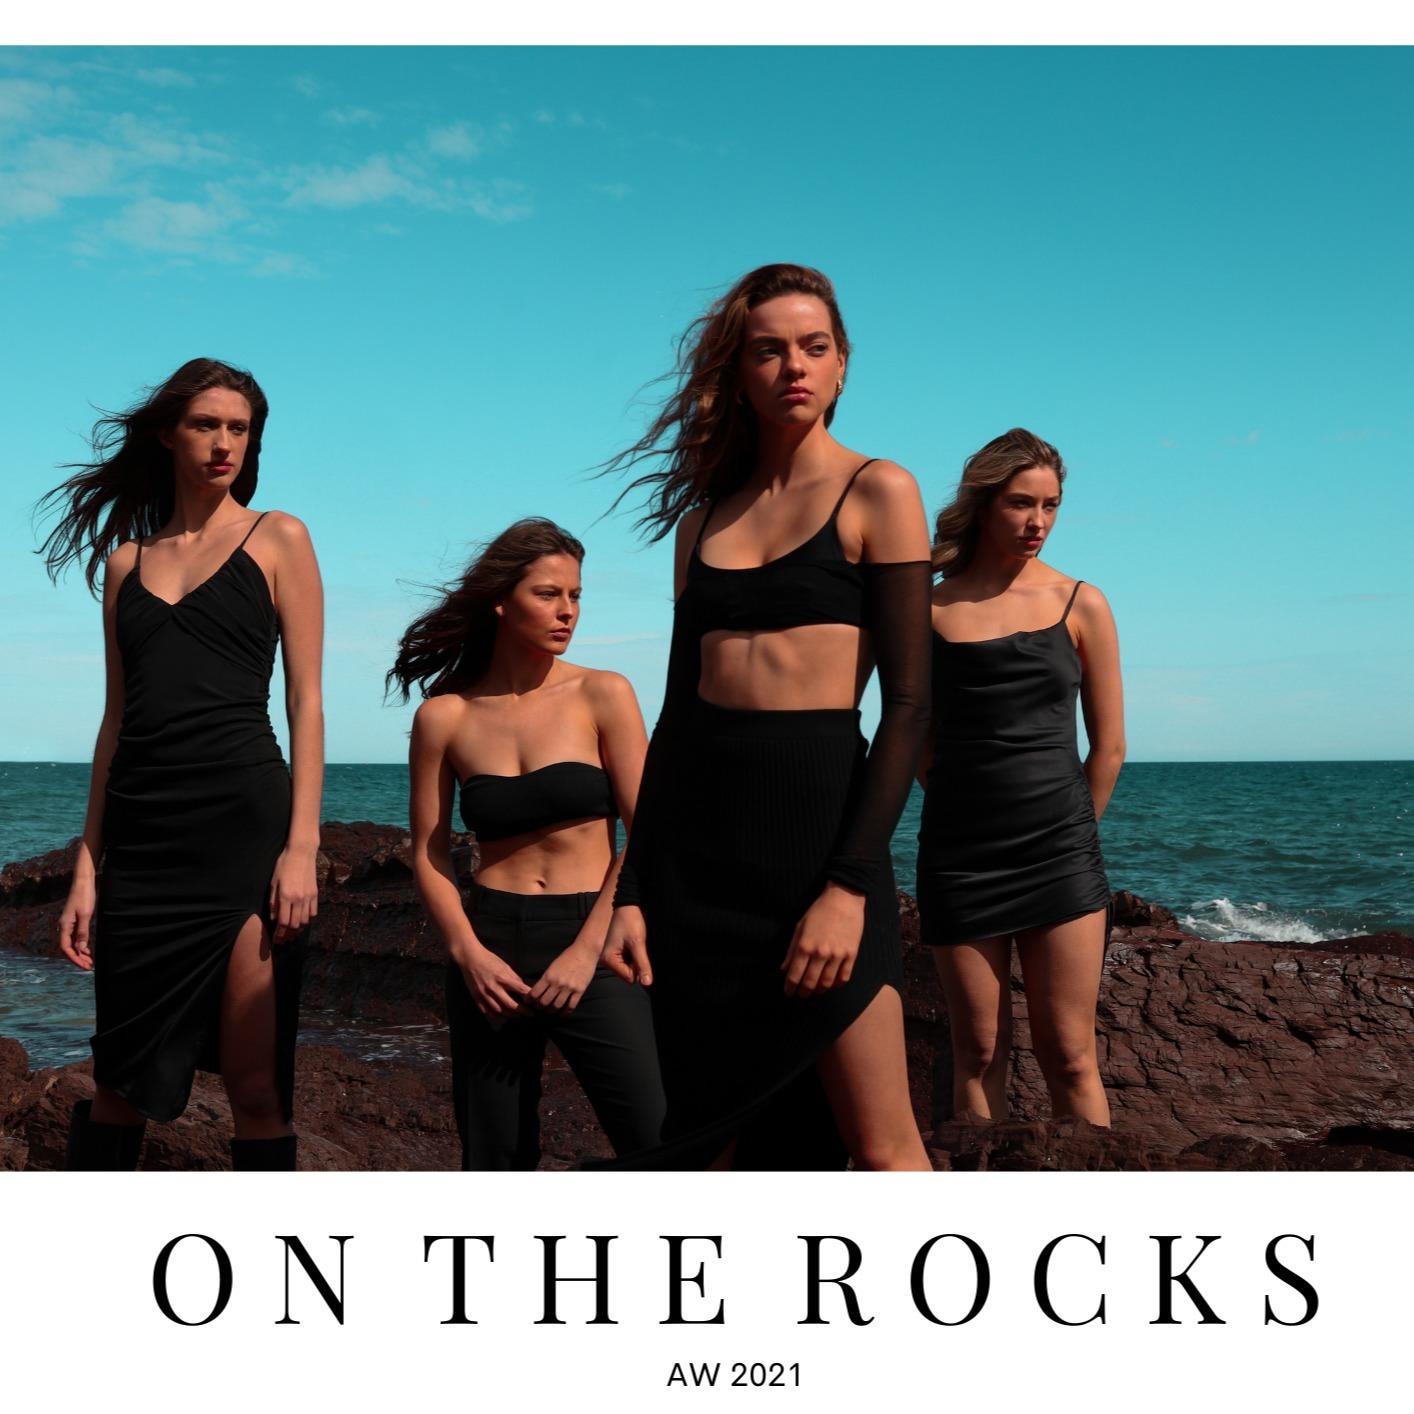 ON THE ROCKS | The Models blog